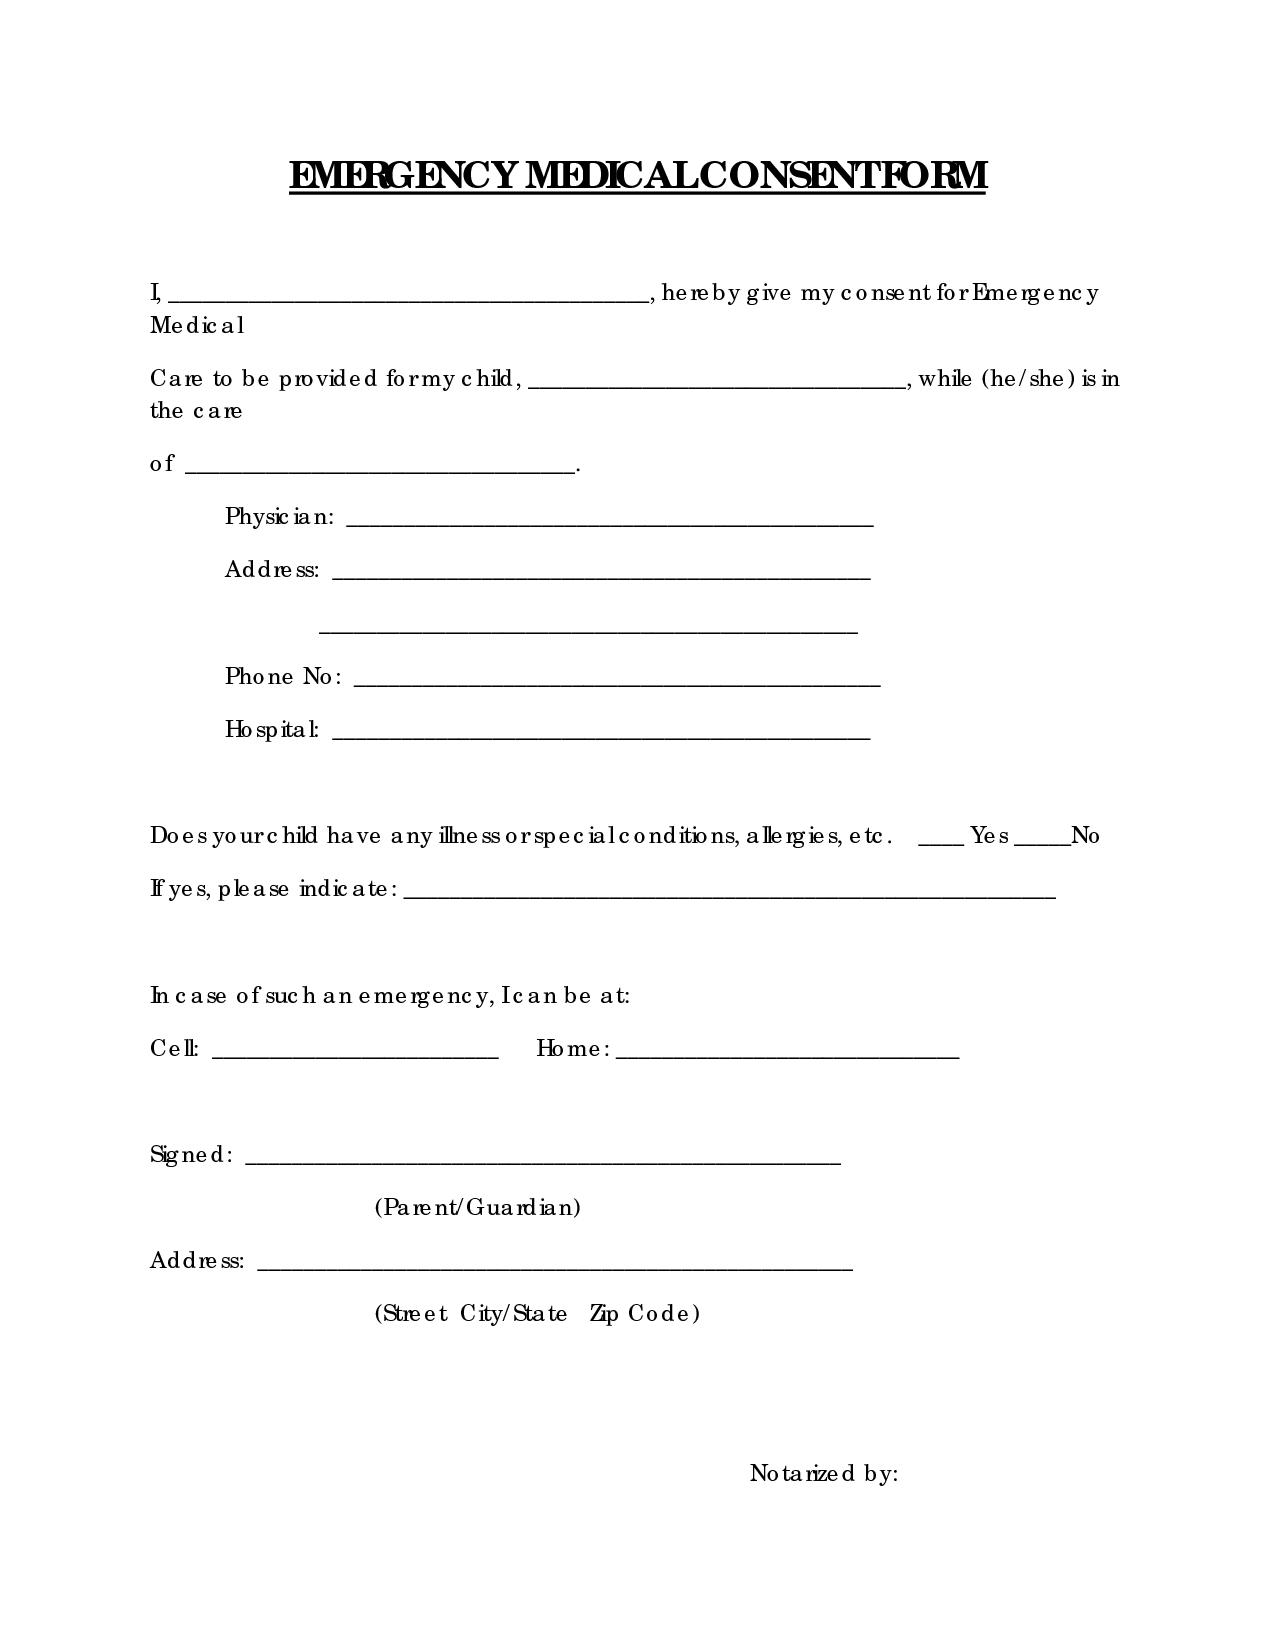 Free Printable Medical Consent Form | Emergency Medical Consent Form - Free Printable Medical Forms Kit